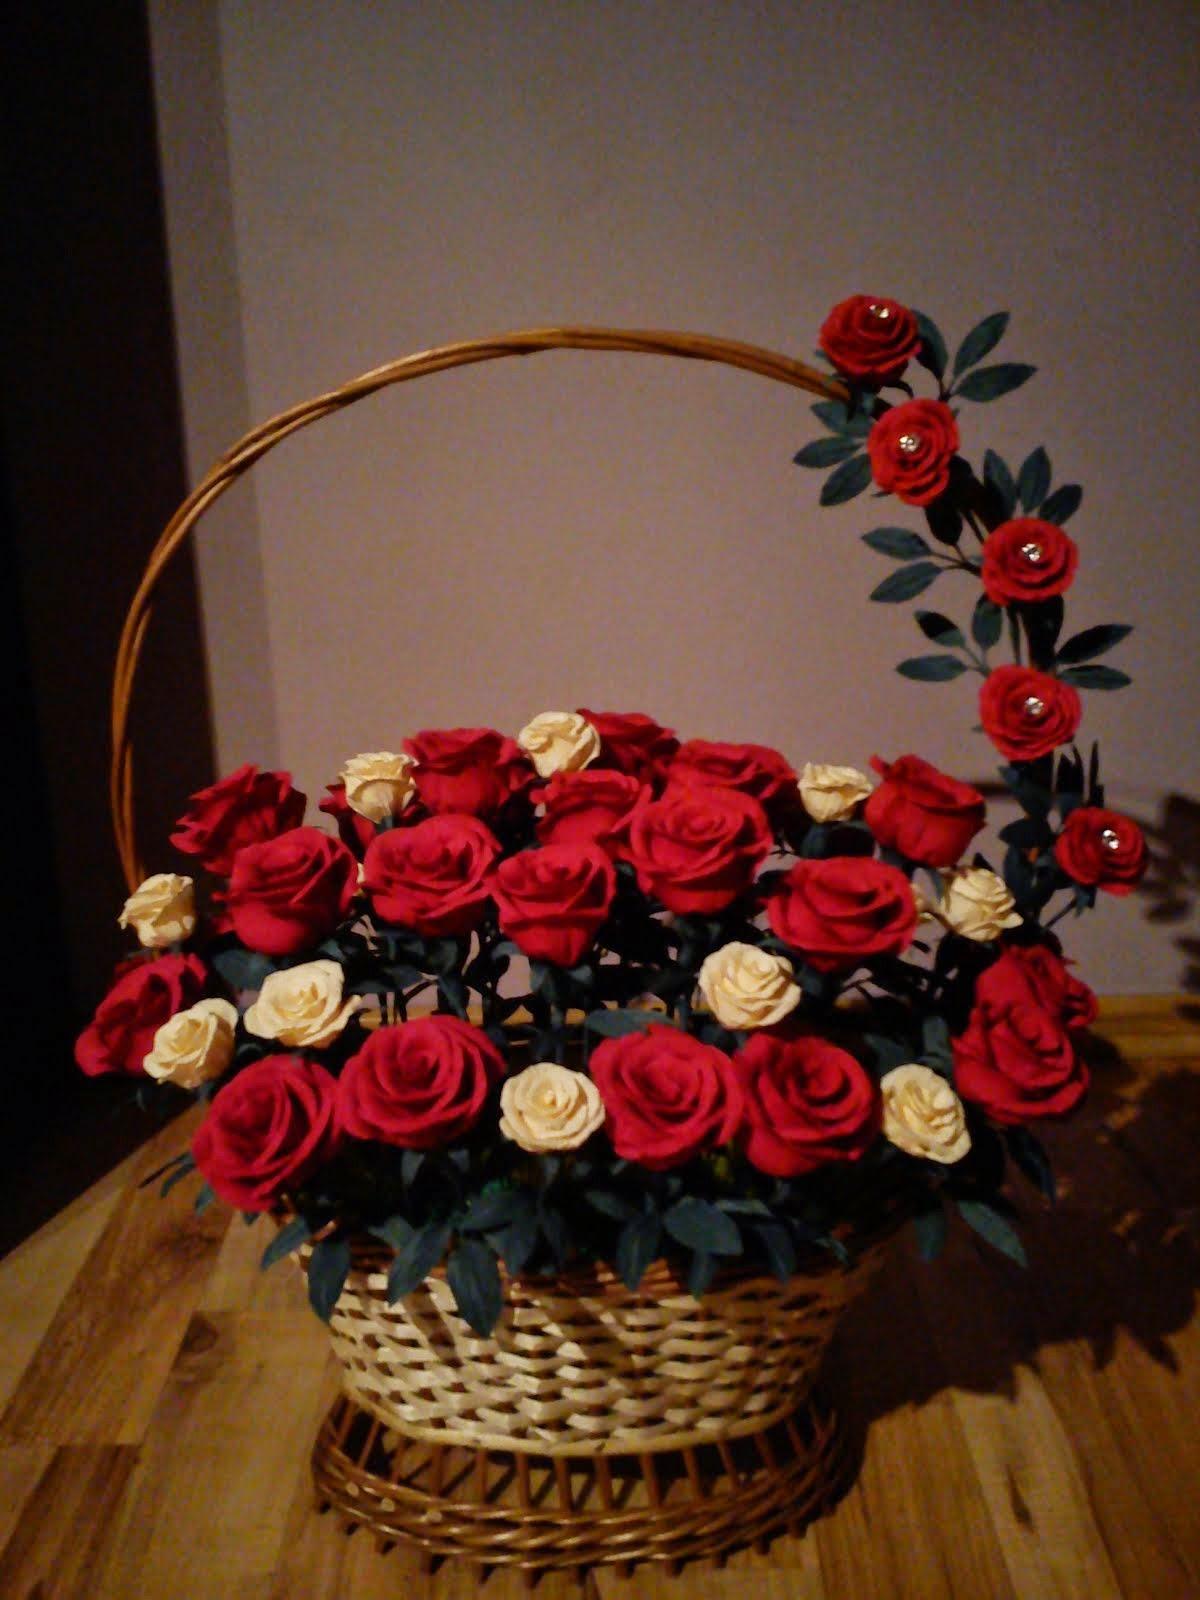 Kosz pełen róż